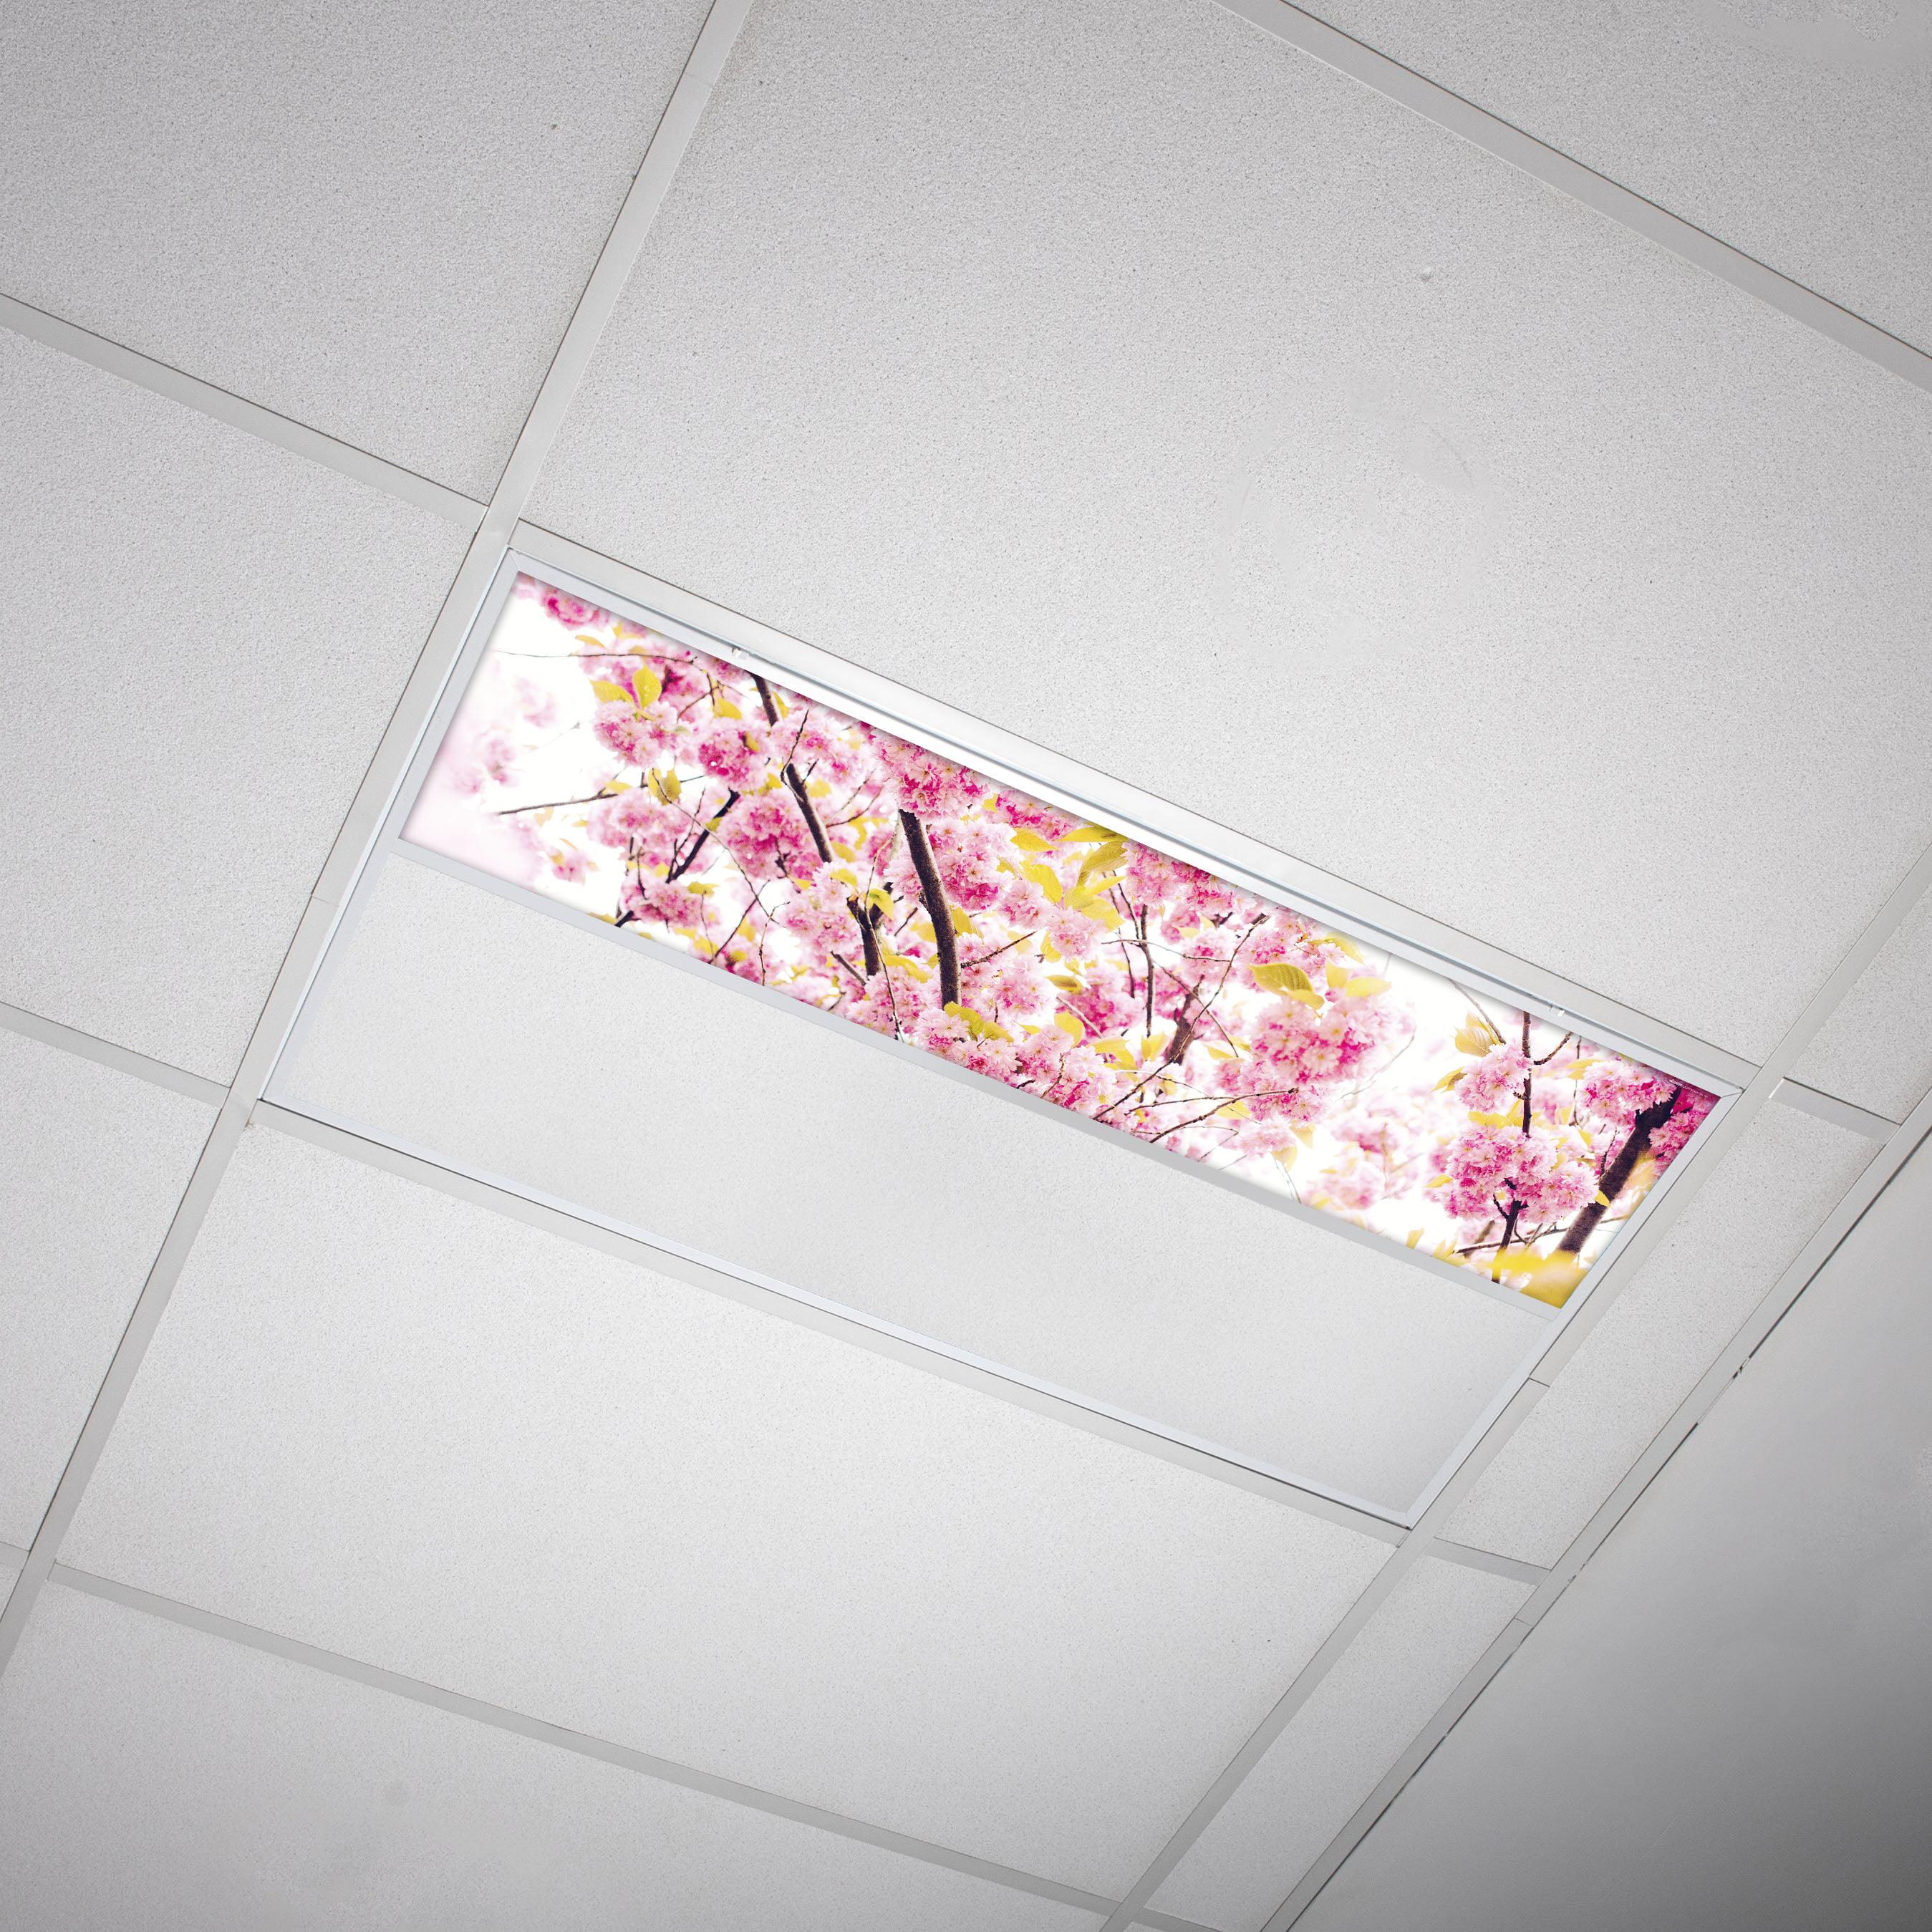 Octo Lights Fluorescent Light Covers 1x4 Flexible Decorative Light Diffuser Panels Flower For Classrooms And Offices Flower 006 Walmart Com Walmart Com